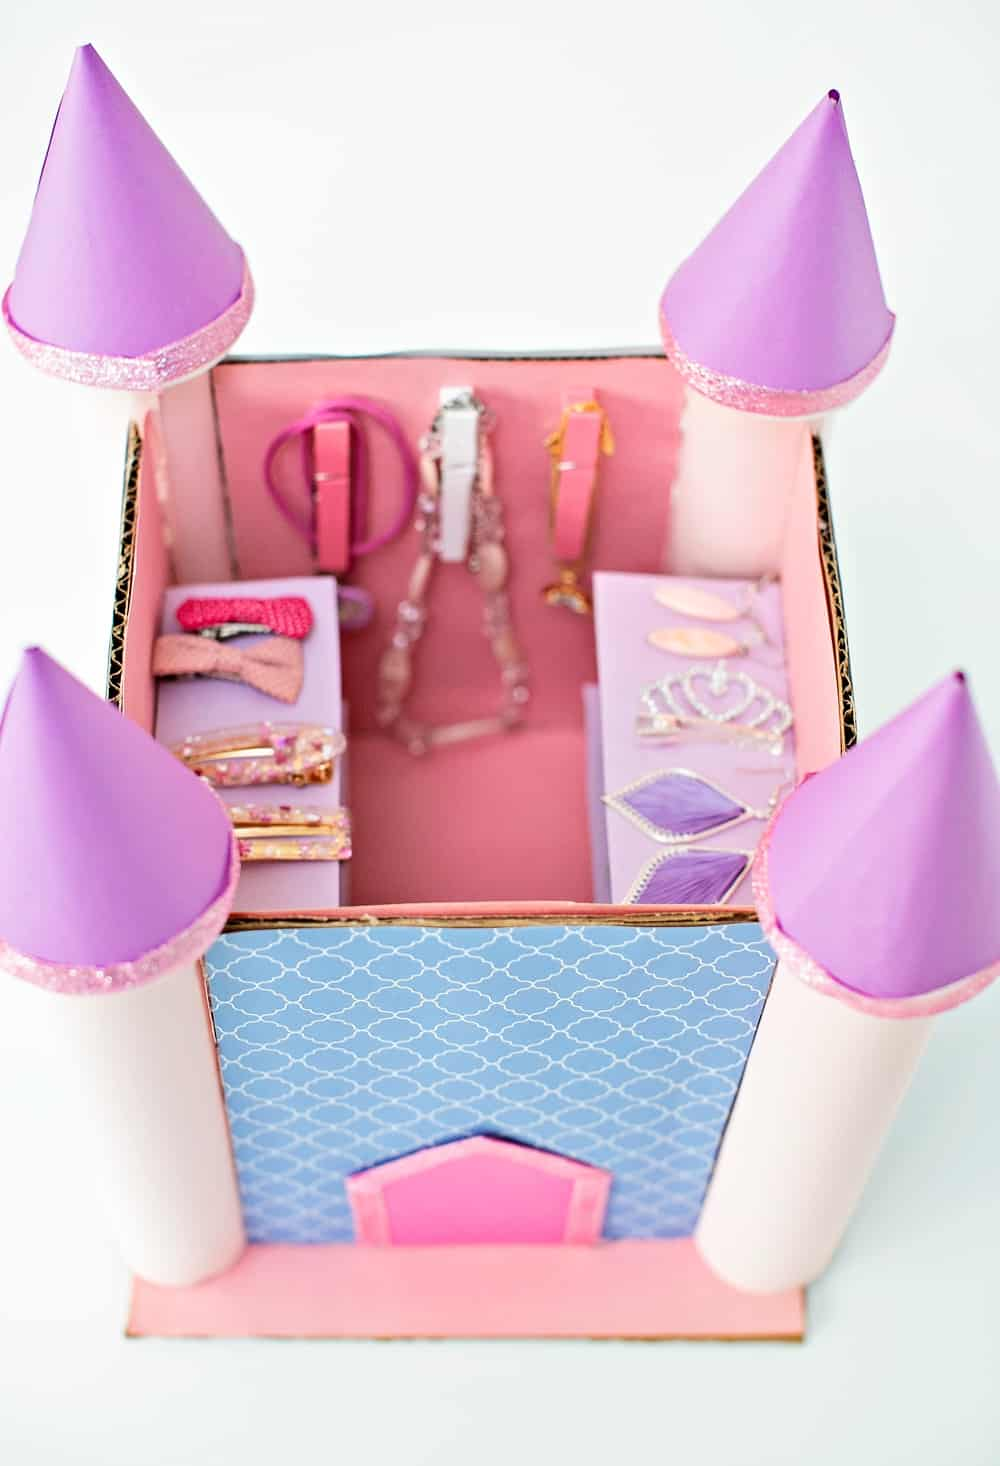 Cardboard Castle Jewelry Box